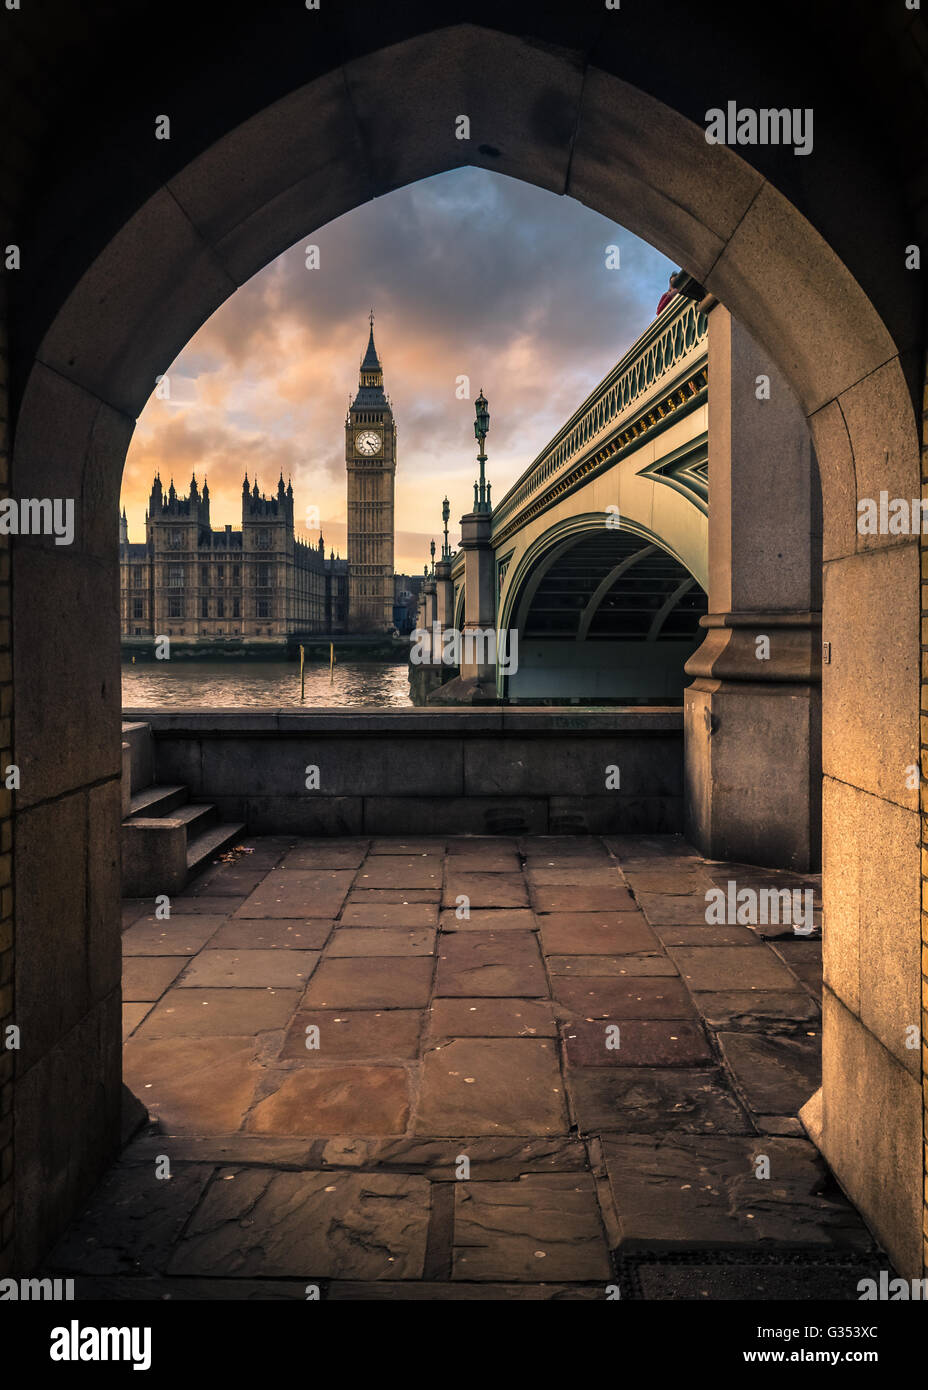 Big Ben at twilight - Stock Image